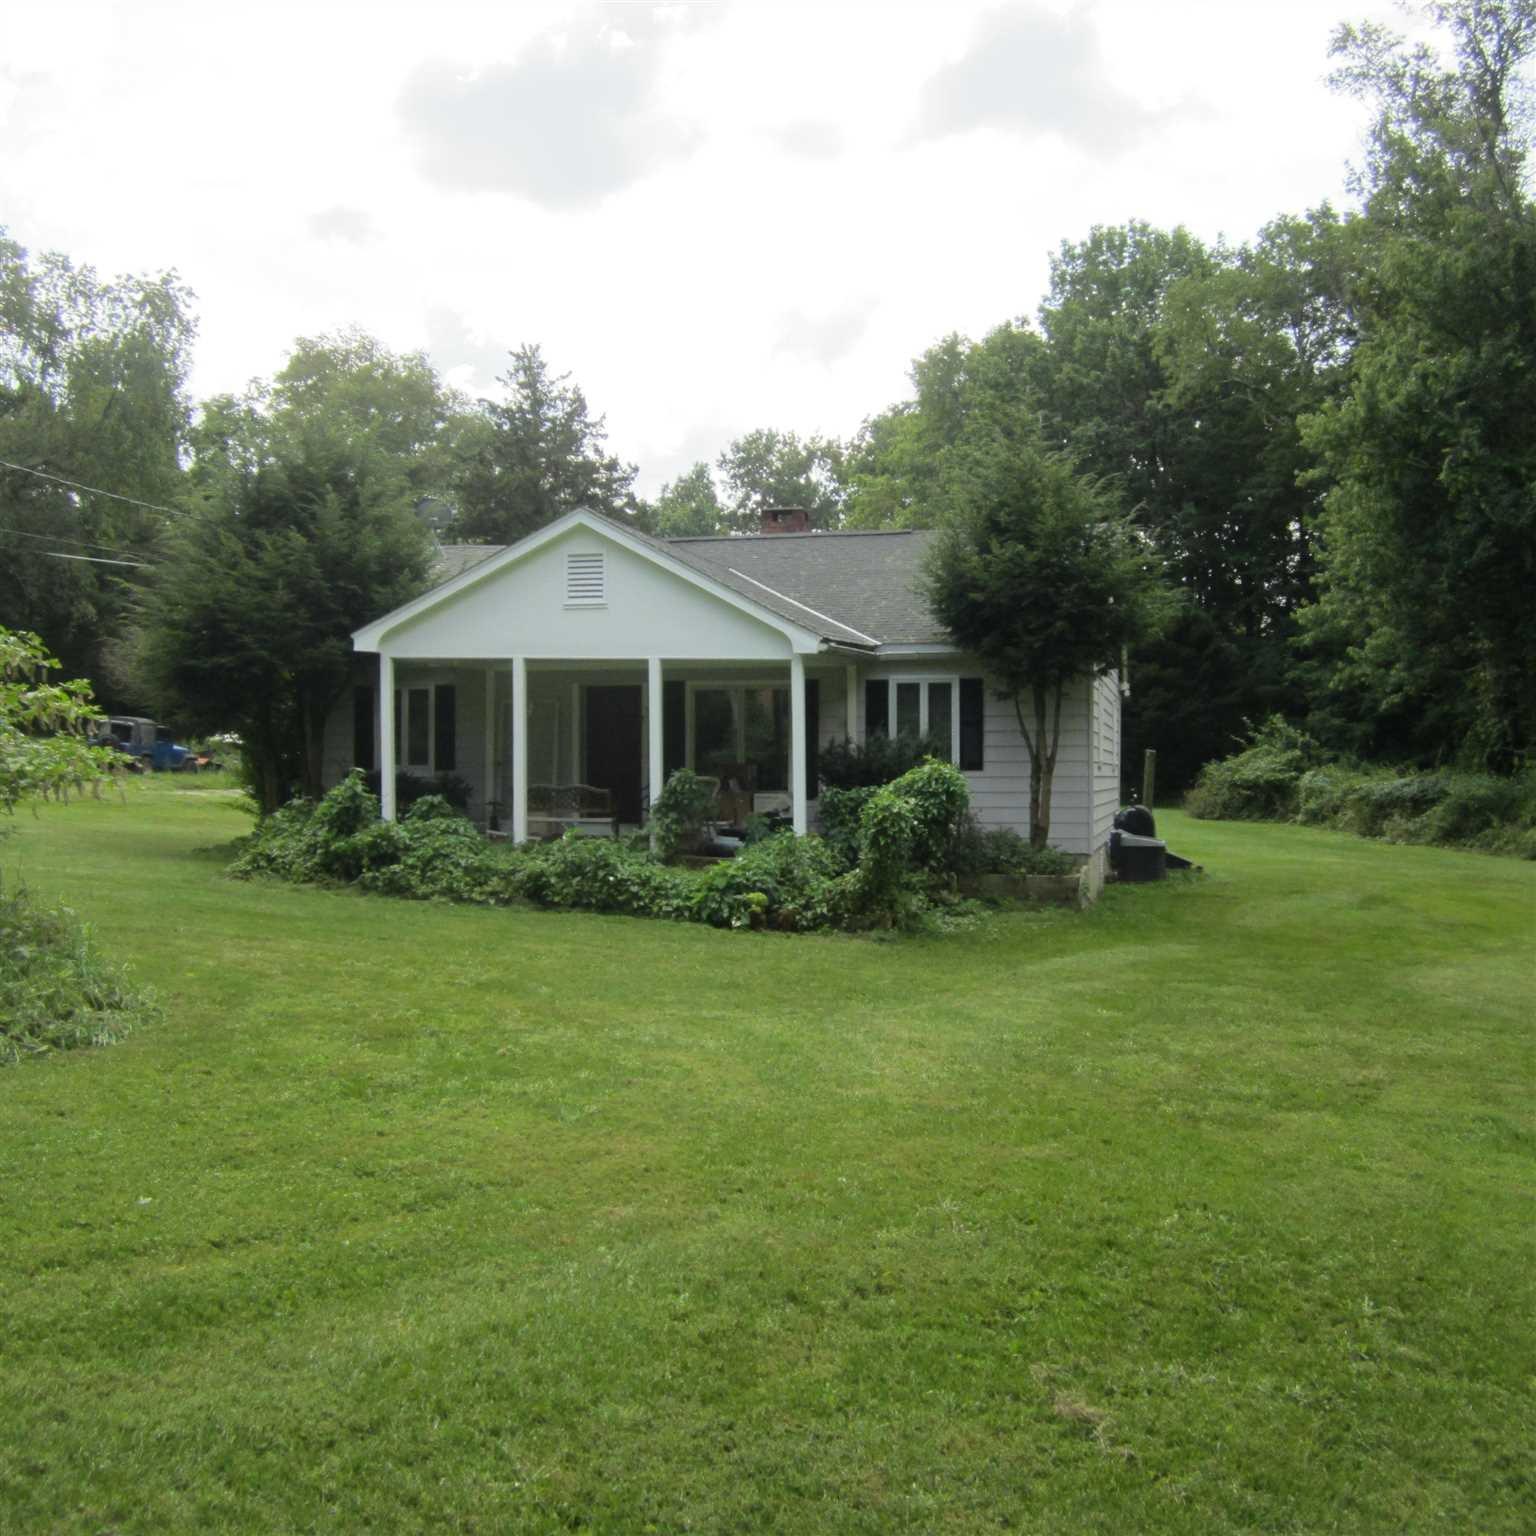 Single Family Home for Sale at 39 LAKE ELLIS Road 39 LAKE ELLIS Road Dover Plains, New York 12594 United States